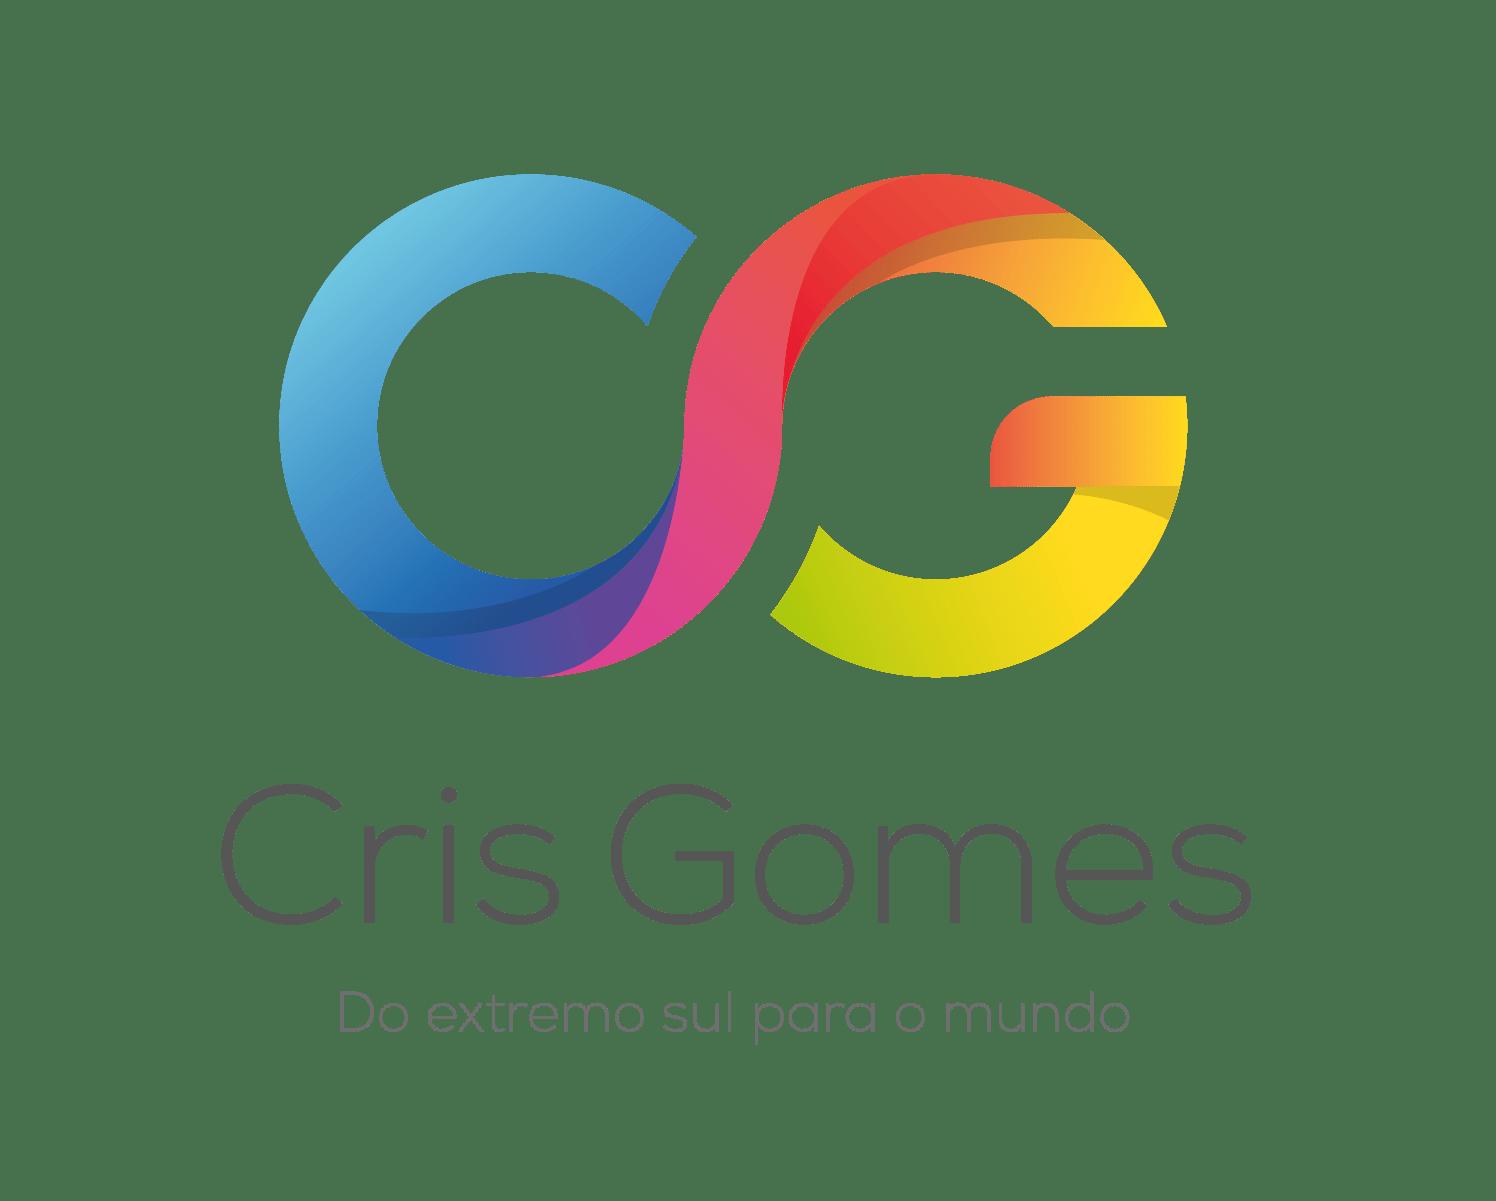 Cris Gomes